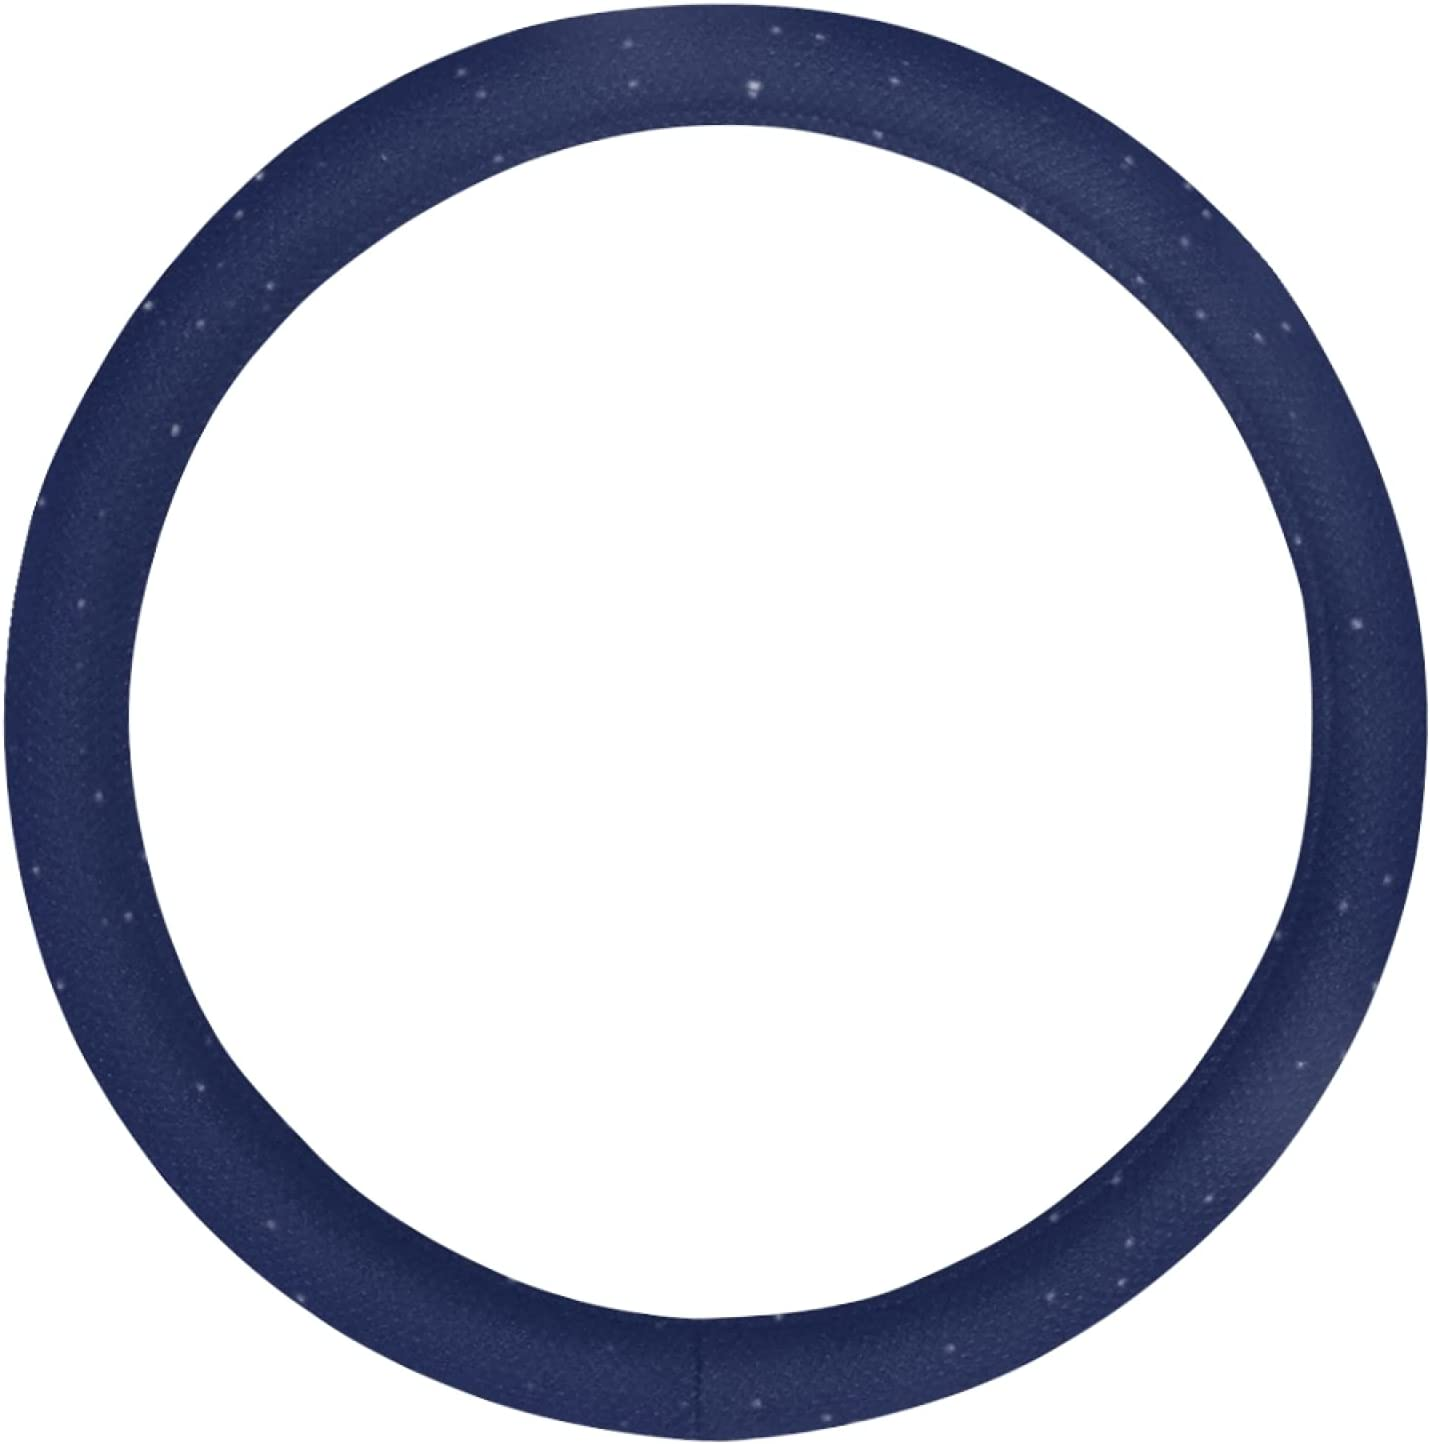 AIKENING Long-awaited Steering Wheel Cover Men Night Sky Max 58% OFF Blue Tree Meteor of